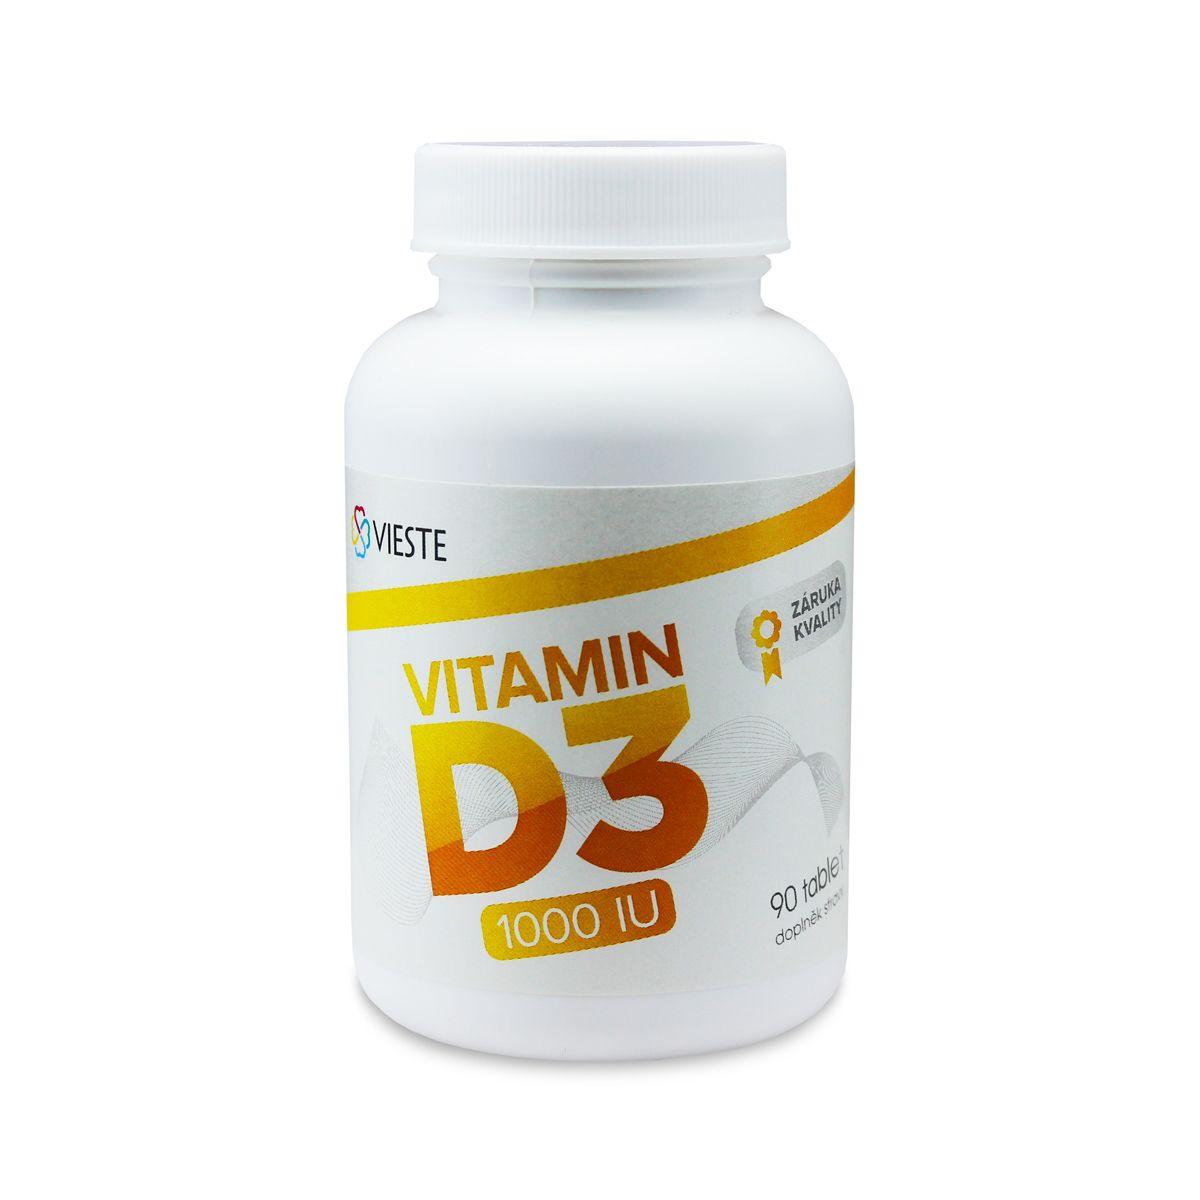 Vieste Vitamin D3 1000 IU 90 tbl